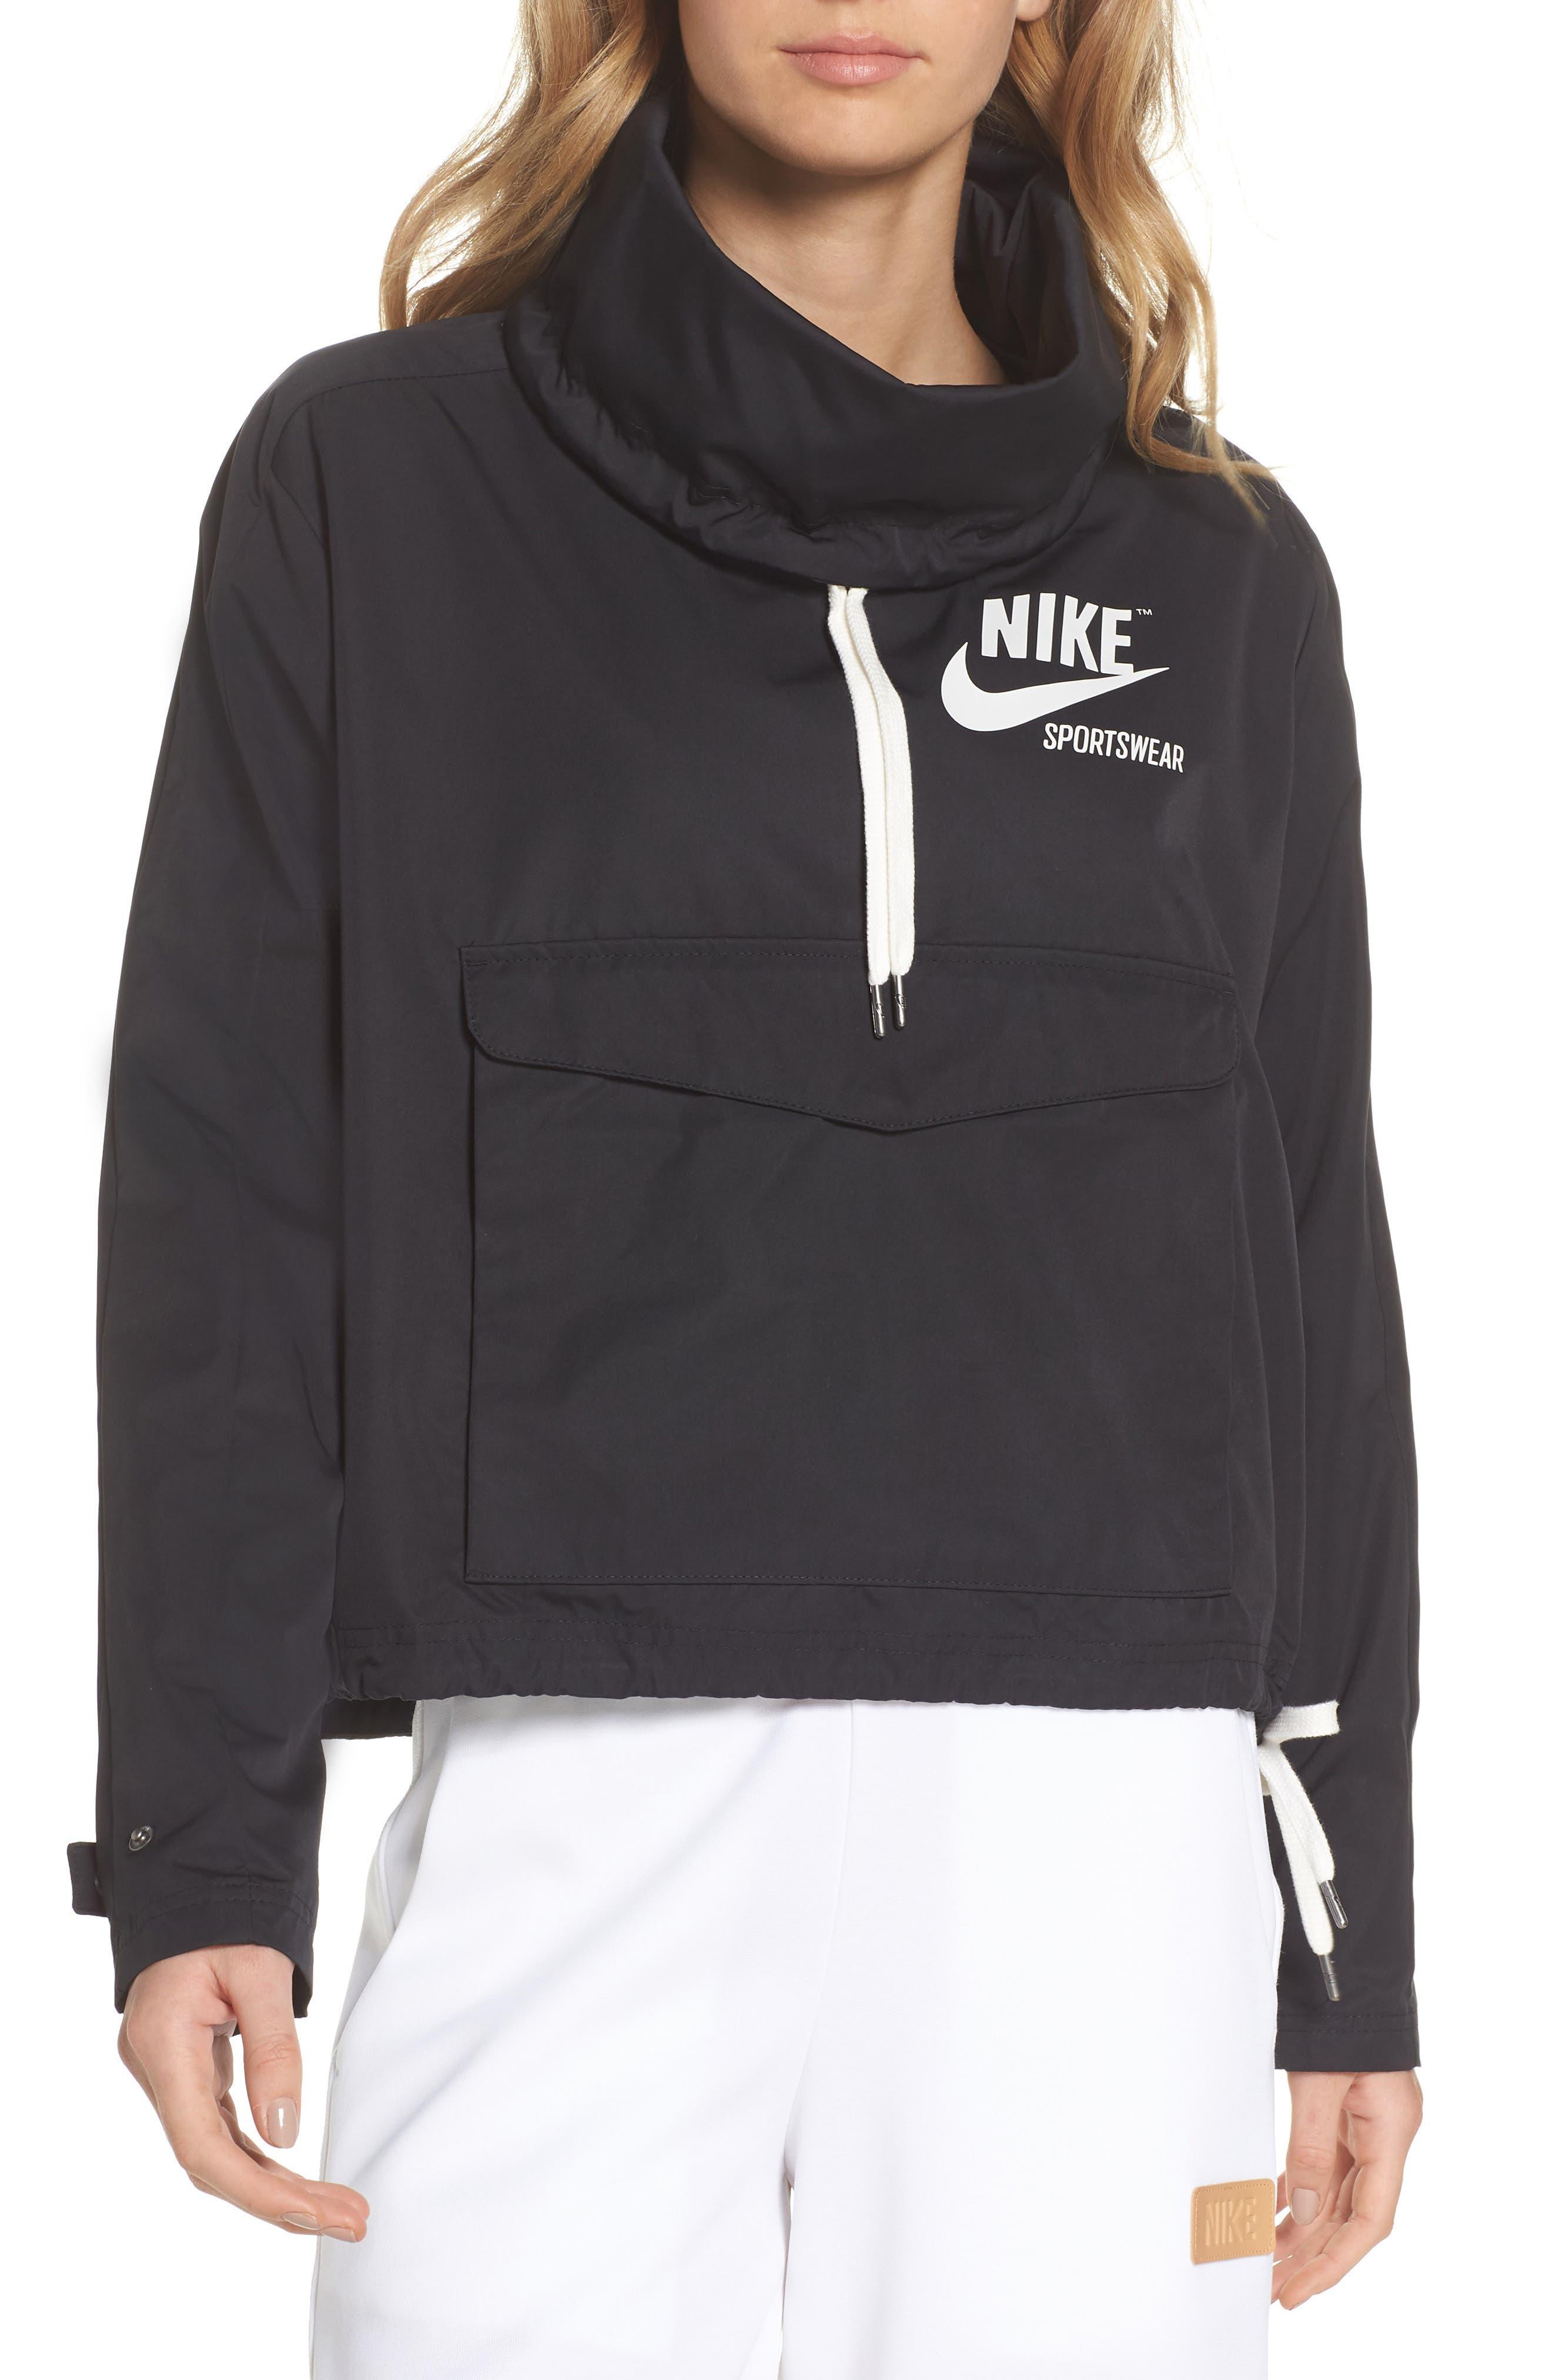 Sportswear Archive Jacket,                         Main,                         color, Black/ Black